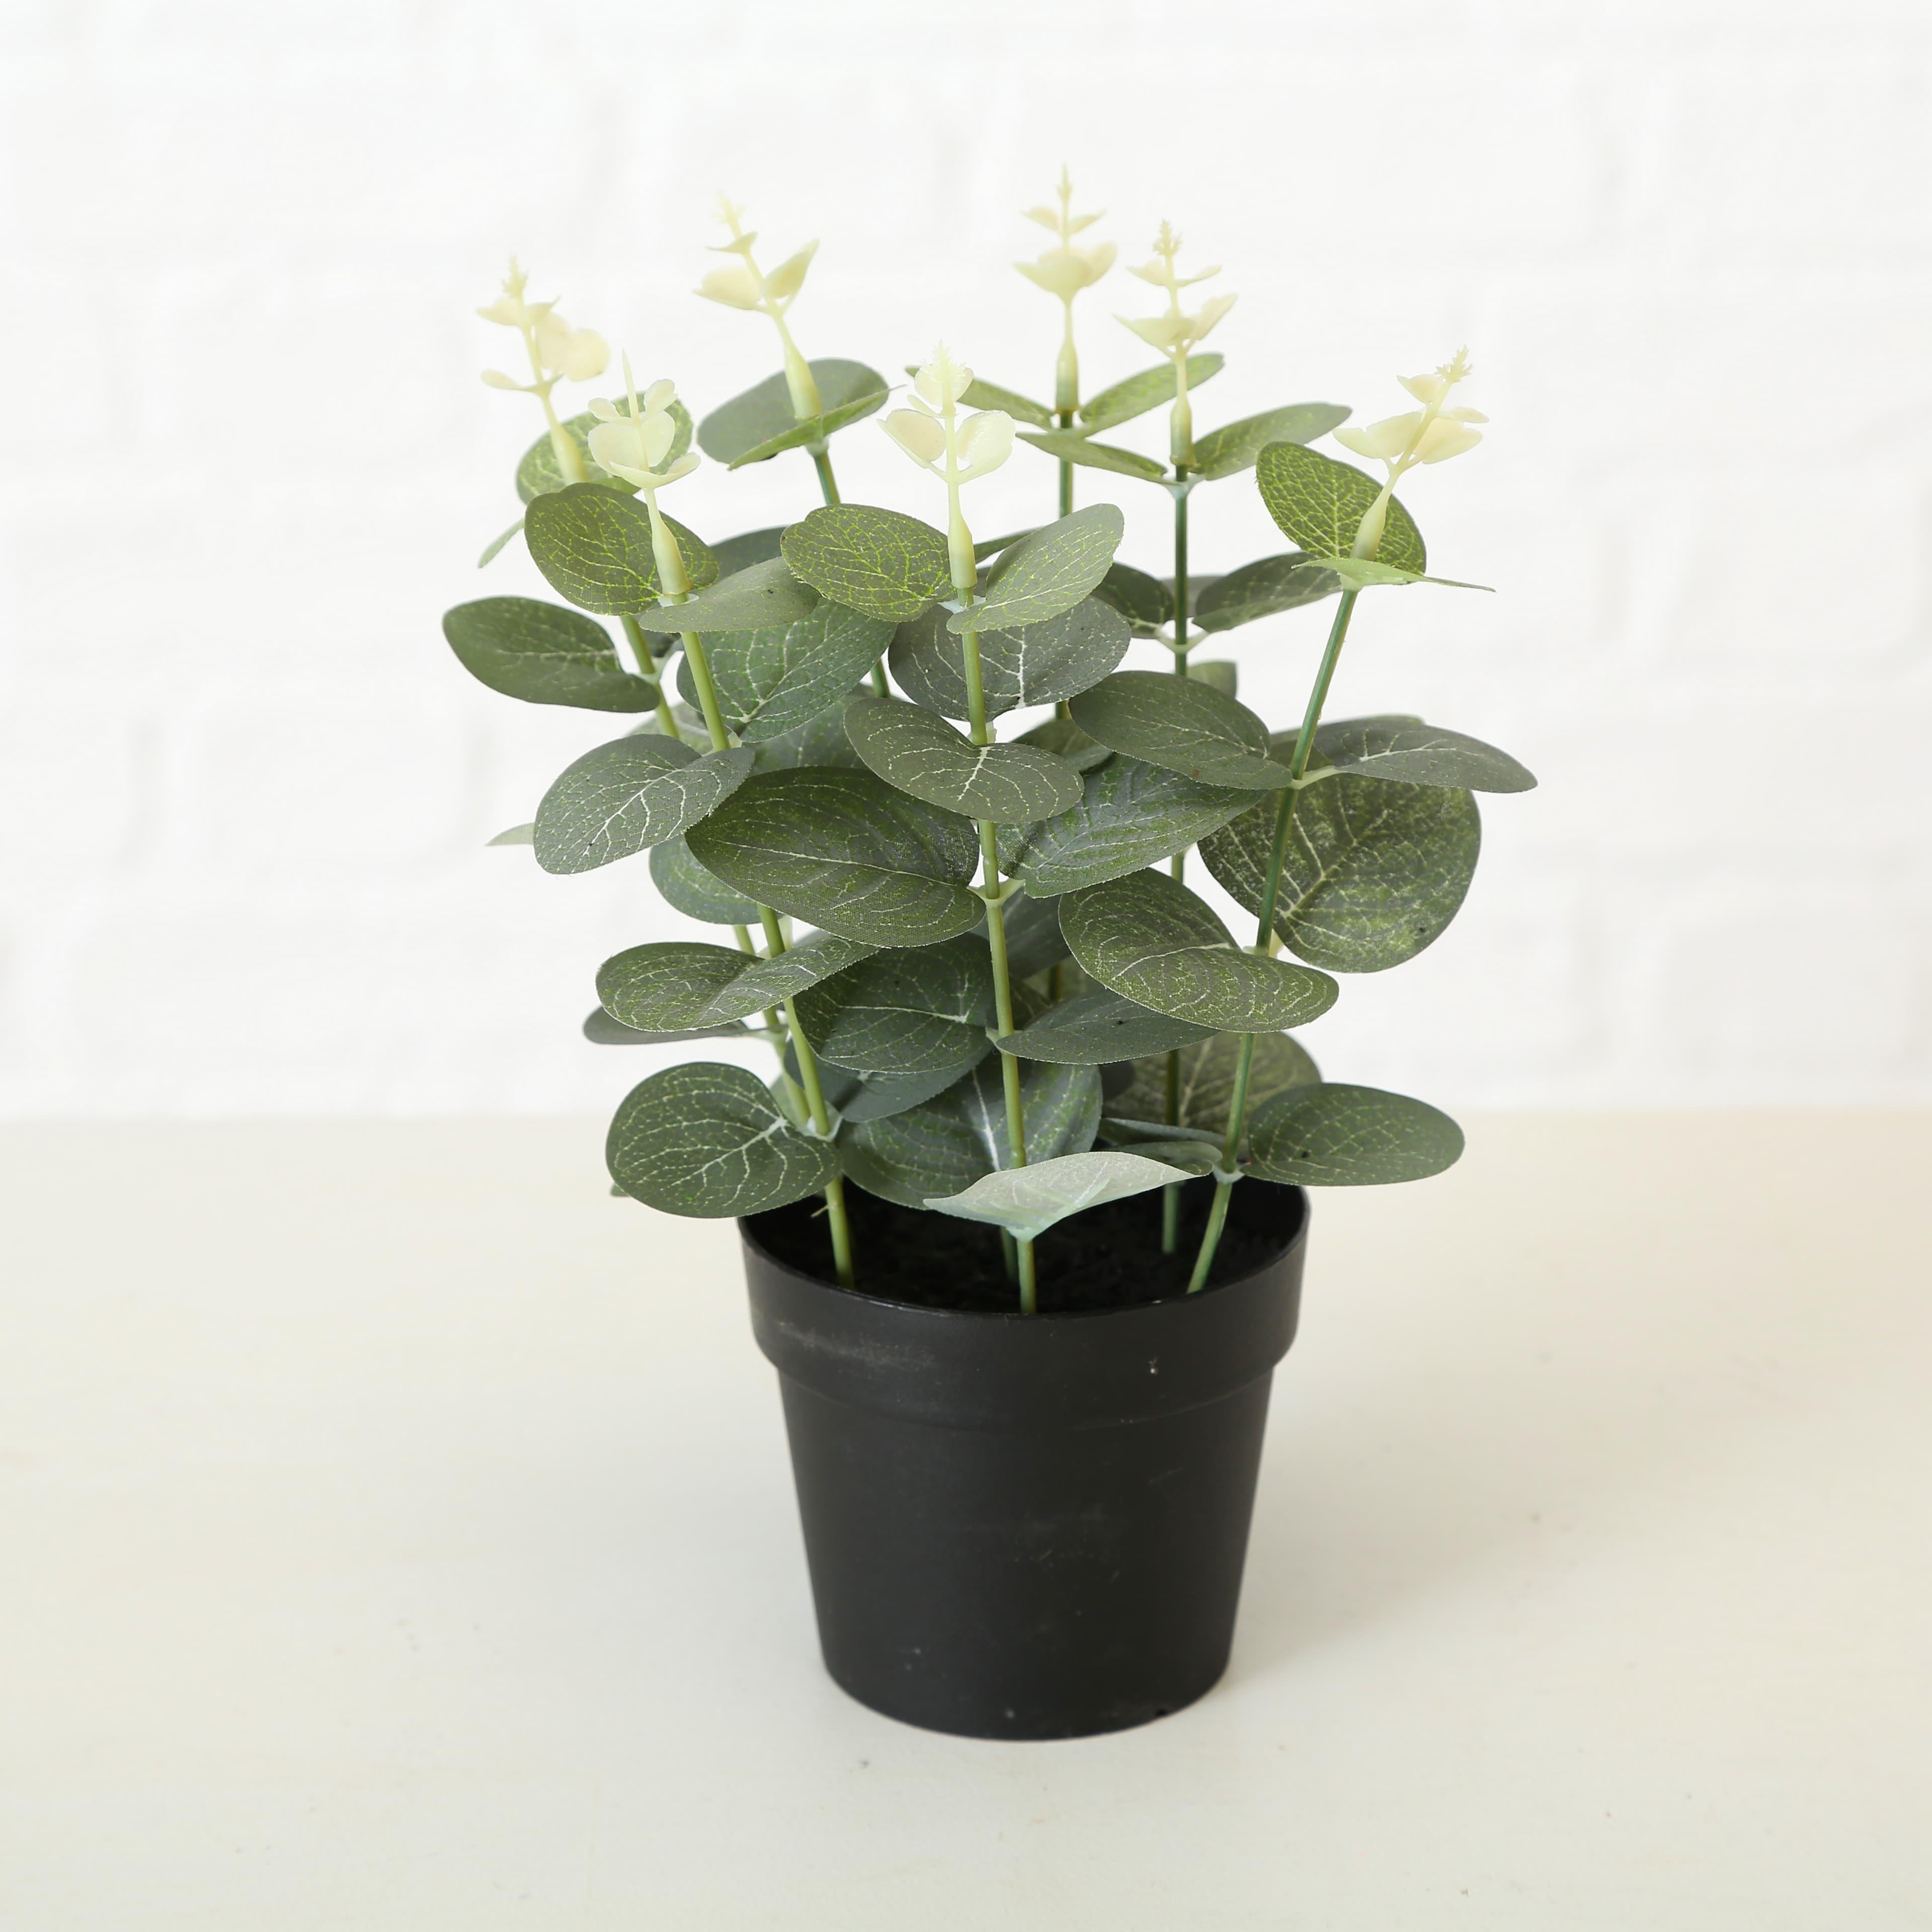 Poza Planta artificiala in ghiveci Monstera Verde / Negru, Modele Asortate, H23 cm